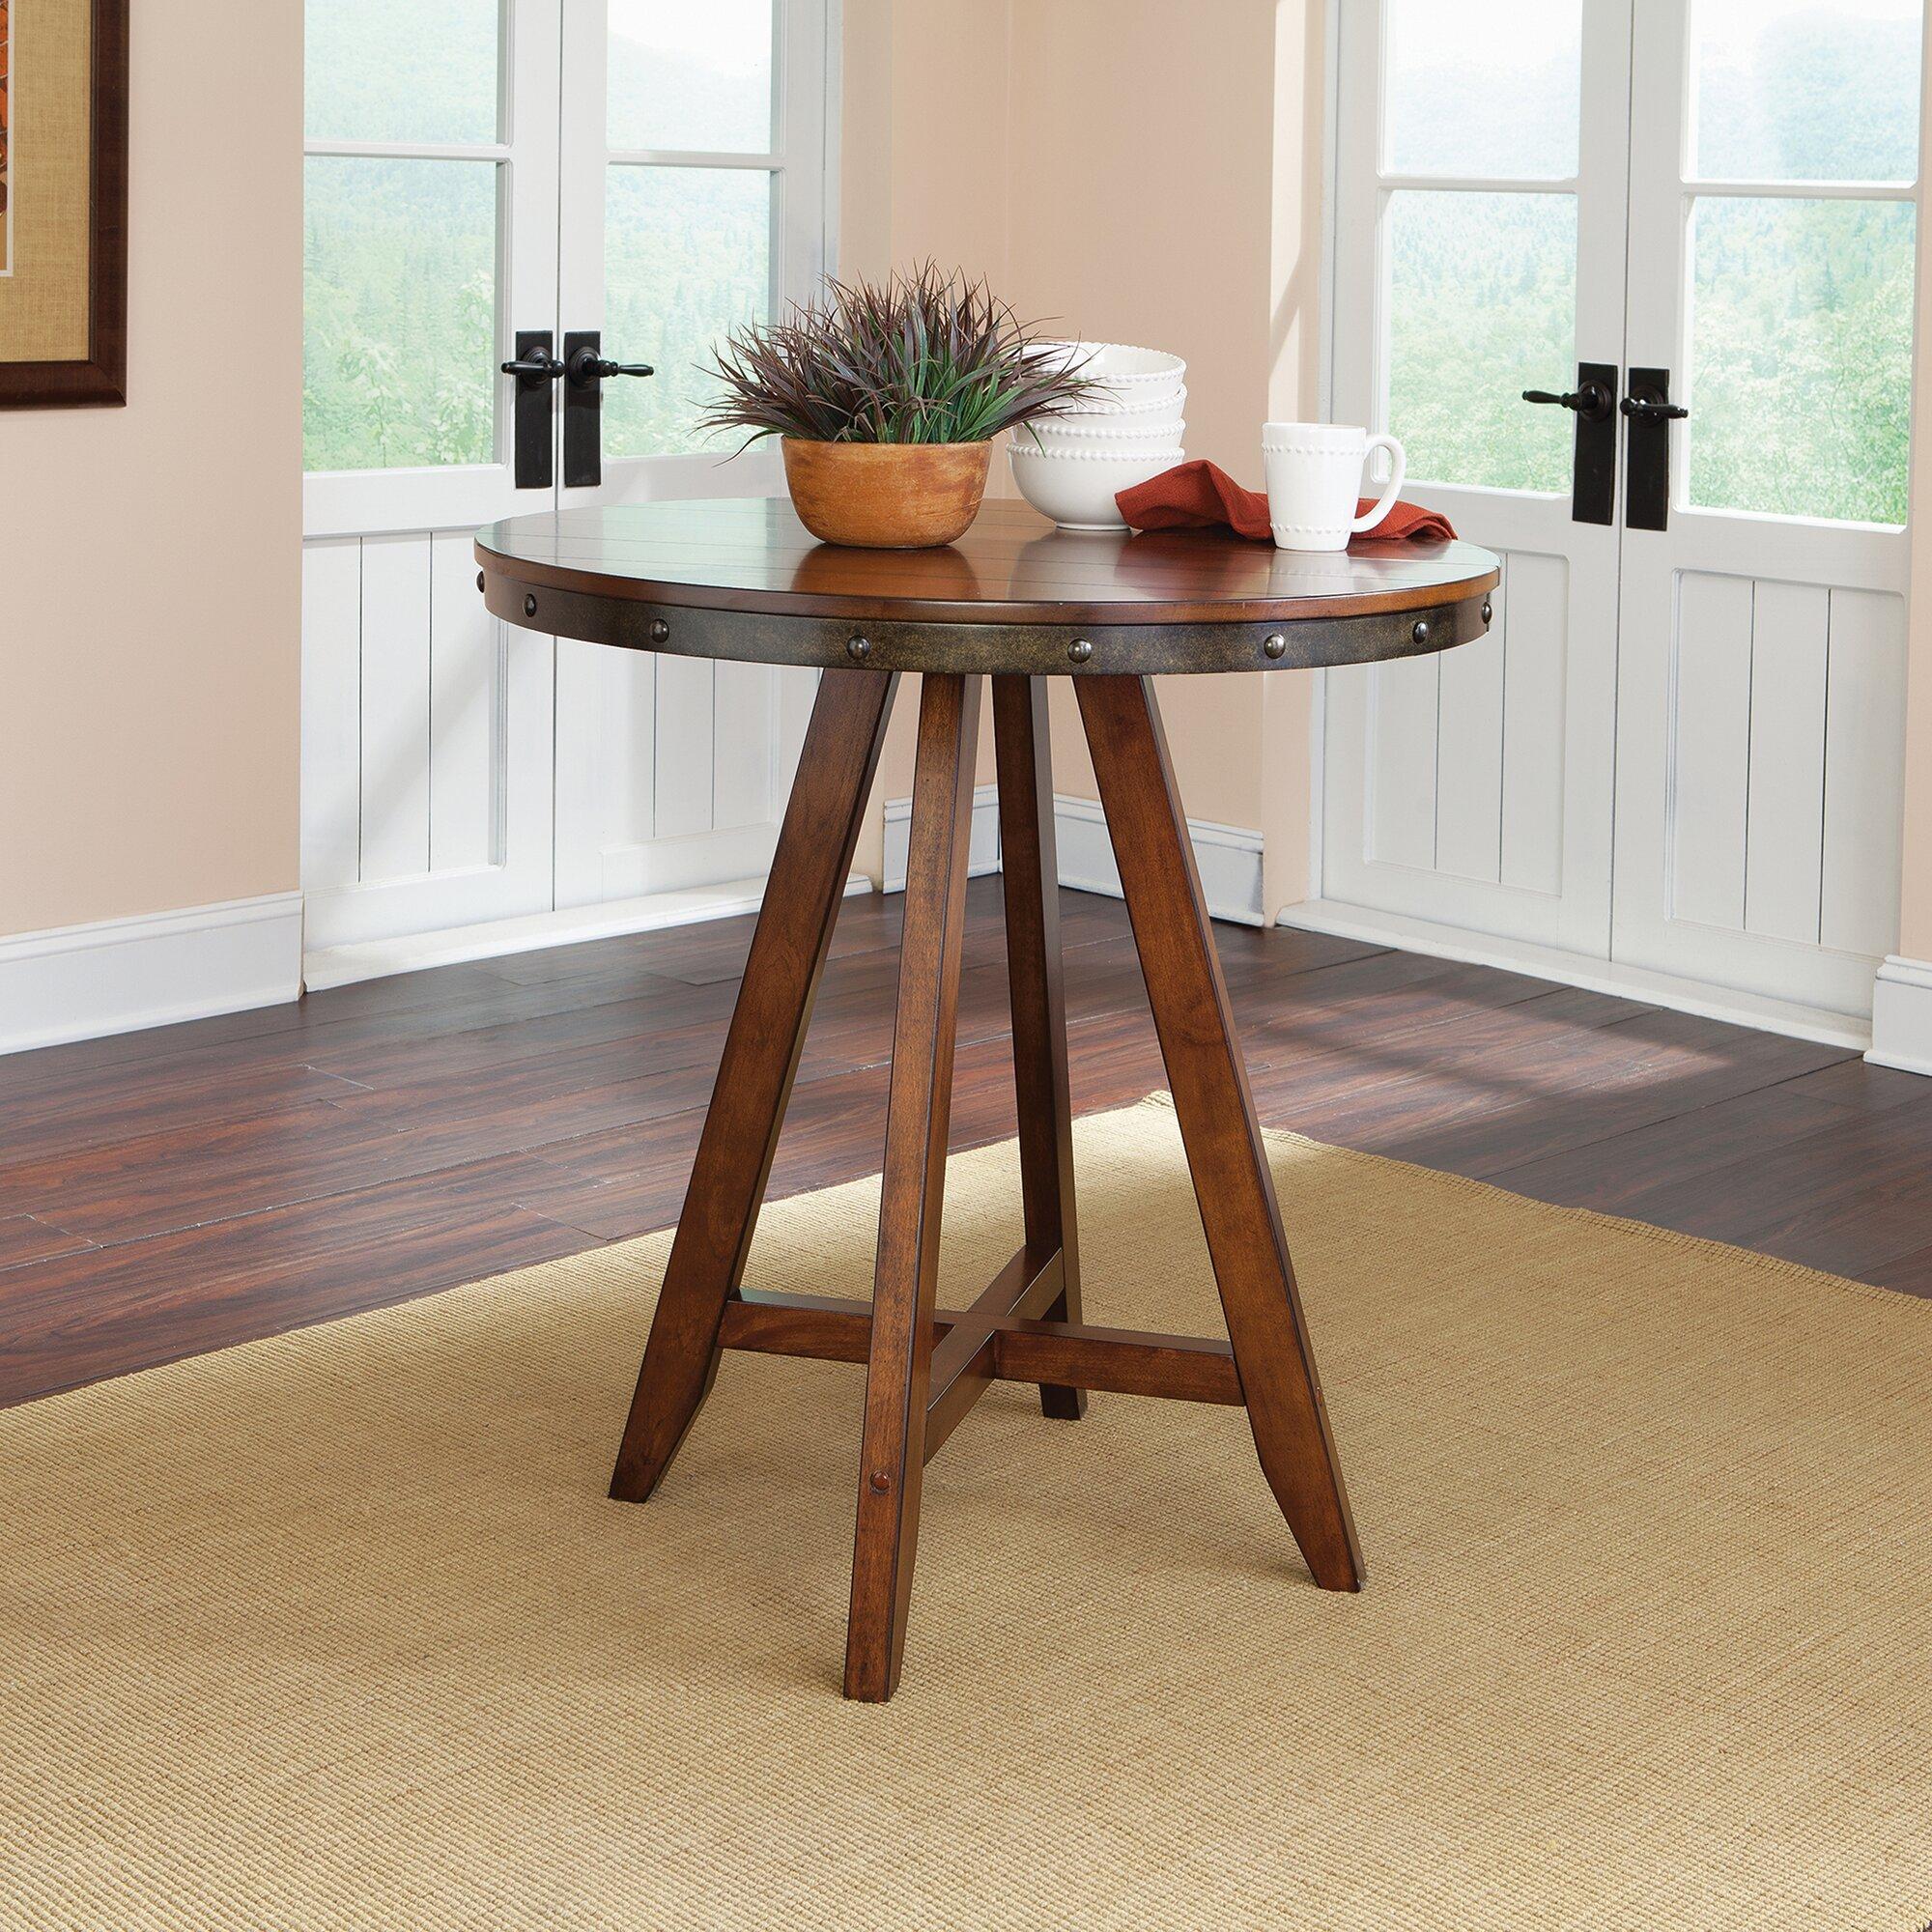 Small round kitchen table - Small Round Kitchen Table